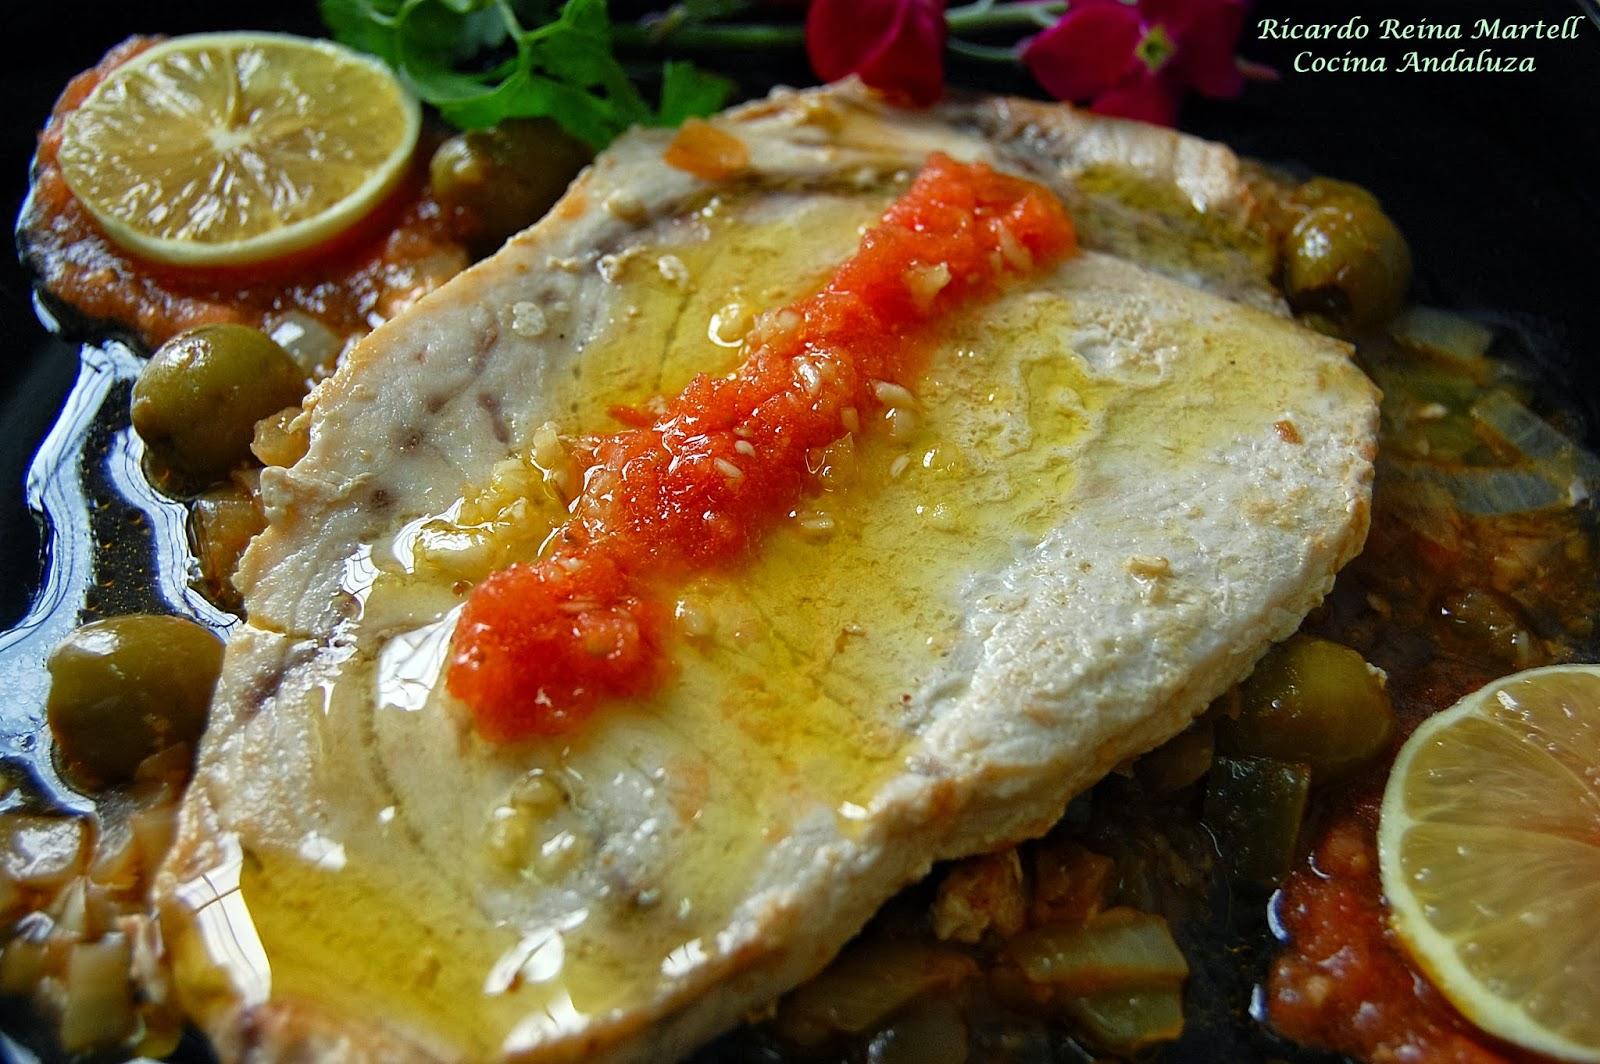 DIETA MEDITERRANEA : RECETAS COCINA ANDALUZA Pez+Esppada+a+la+Andaluza+I